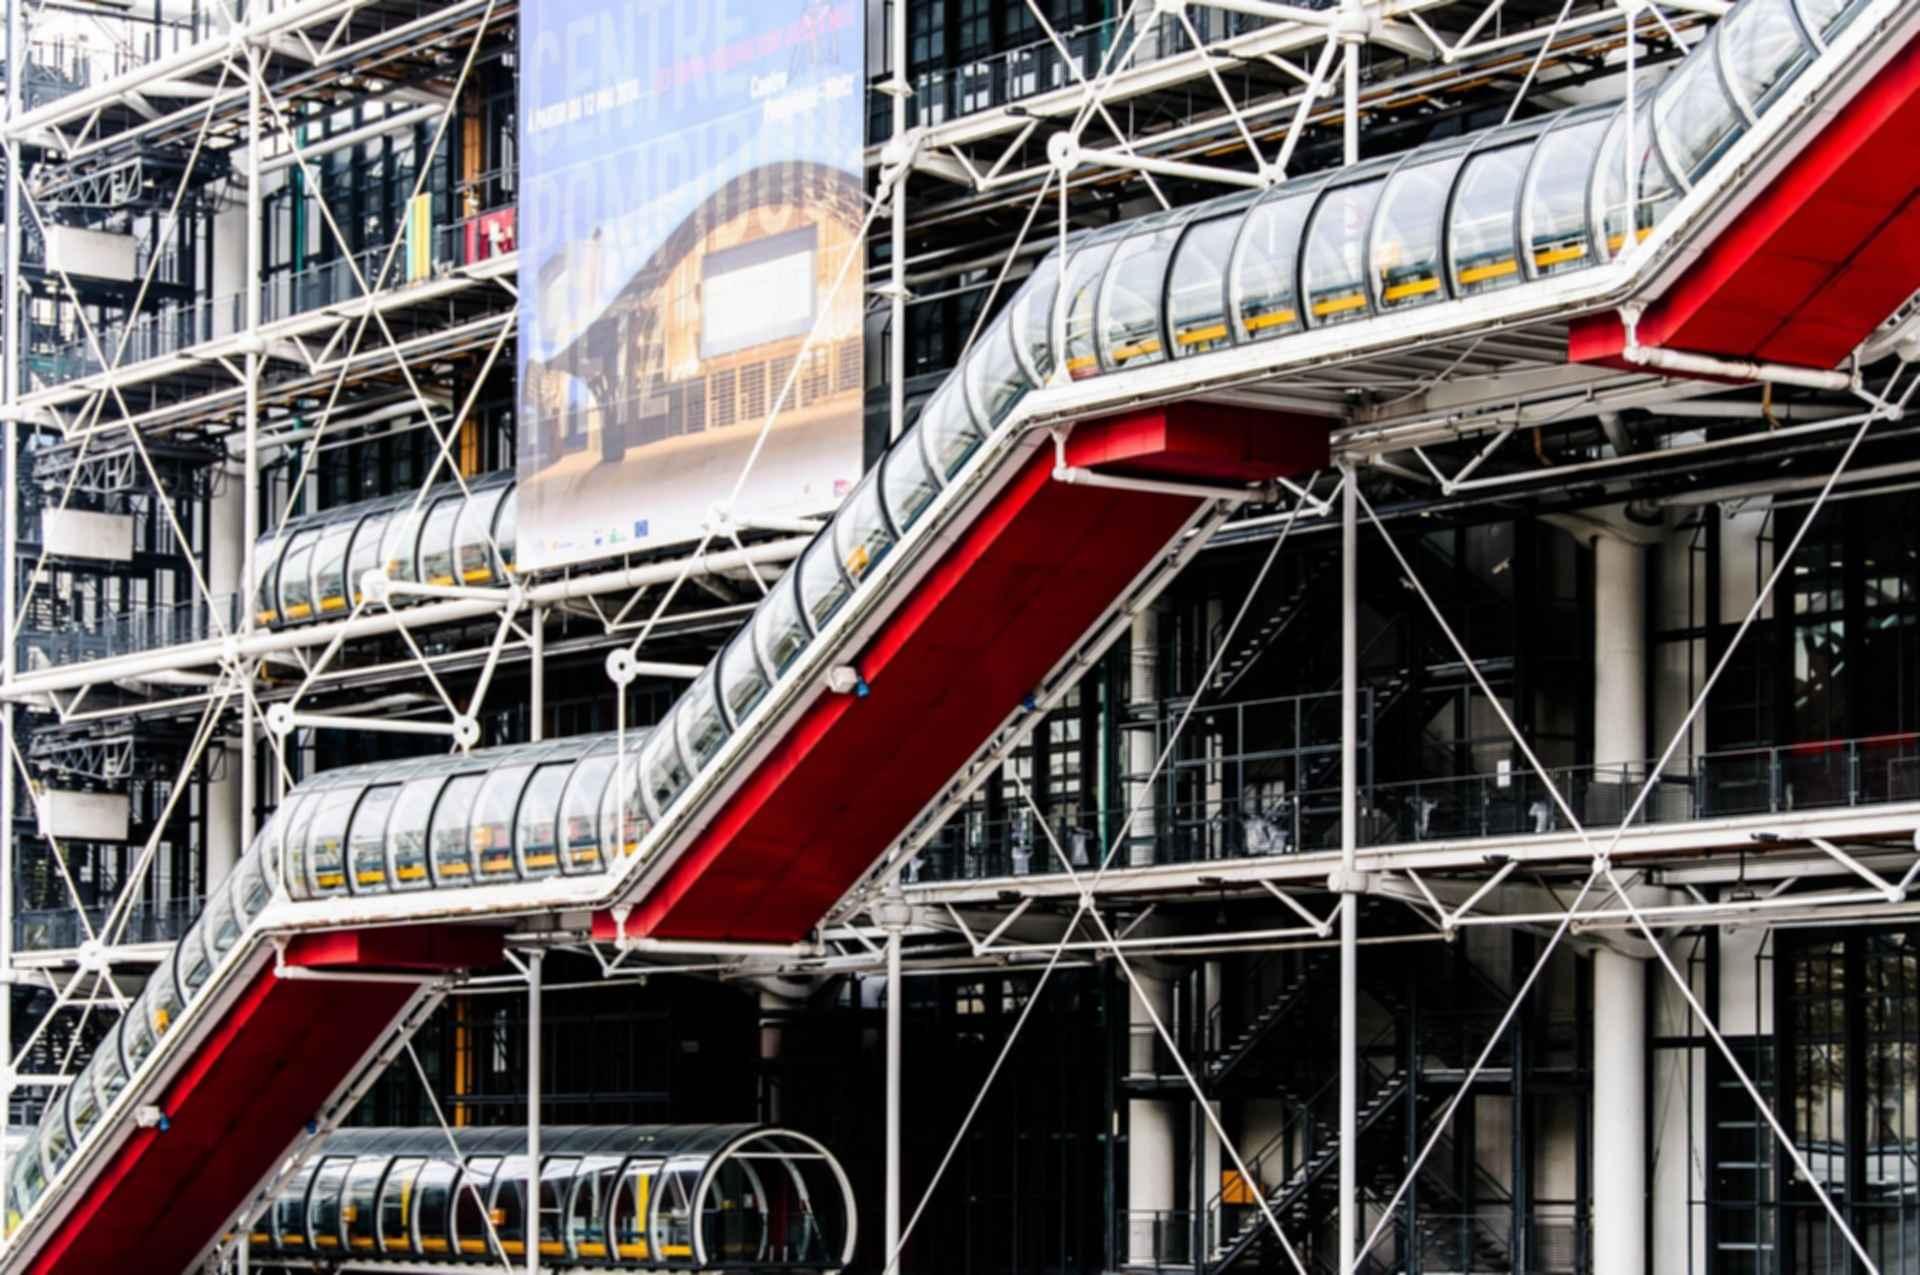 Pompidou Centre - Escalators